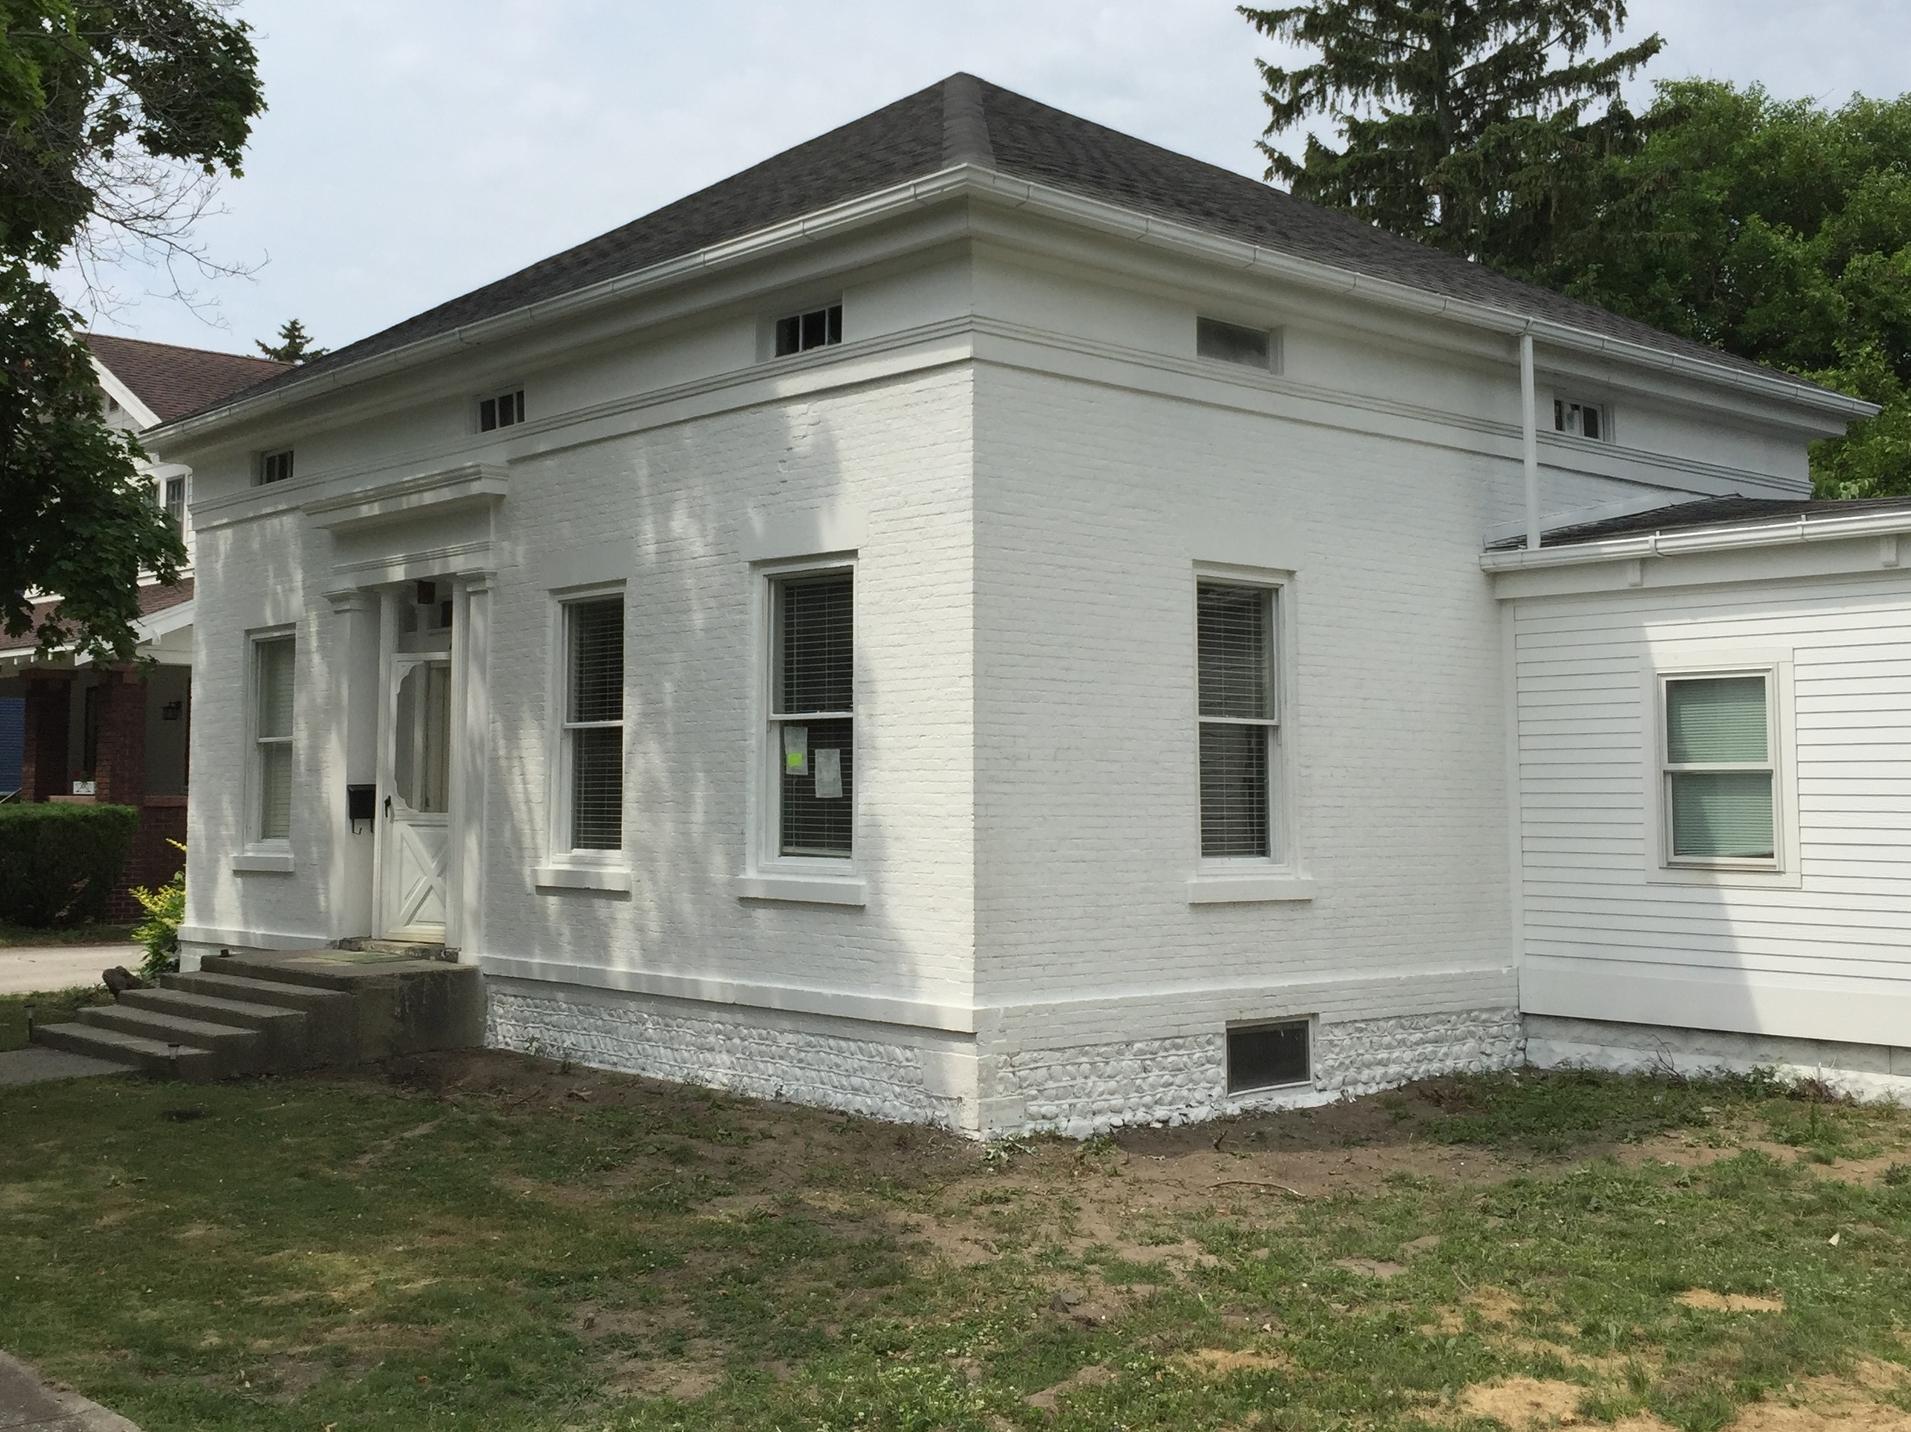 Choate House, 232 Dennis Street, 1853